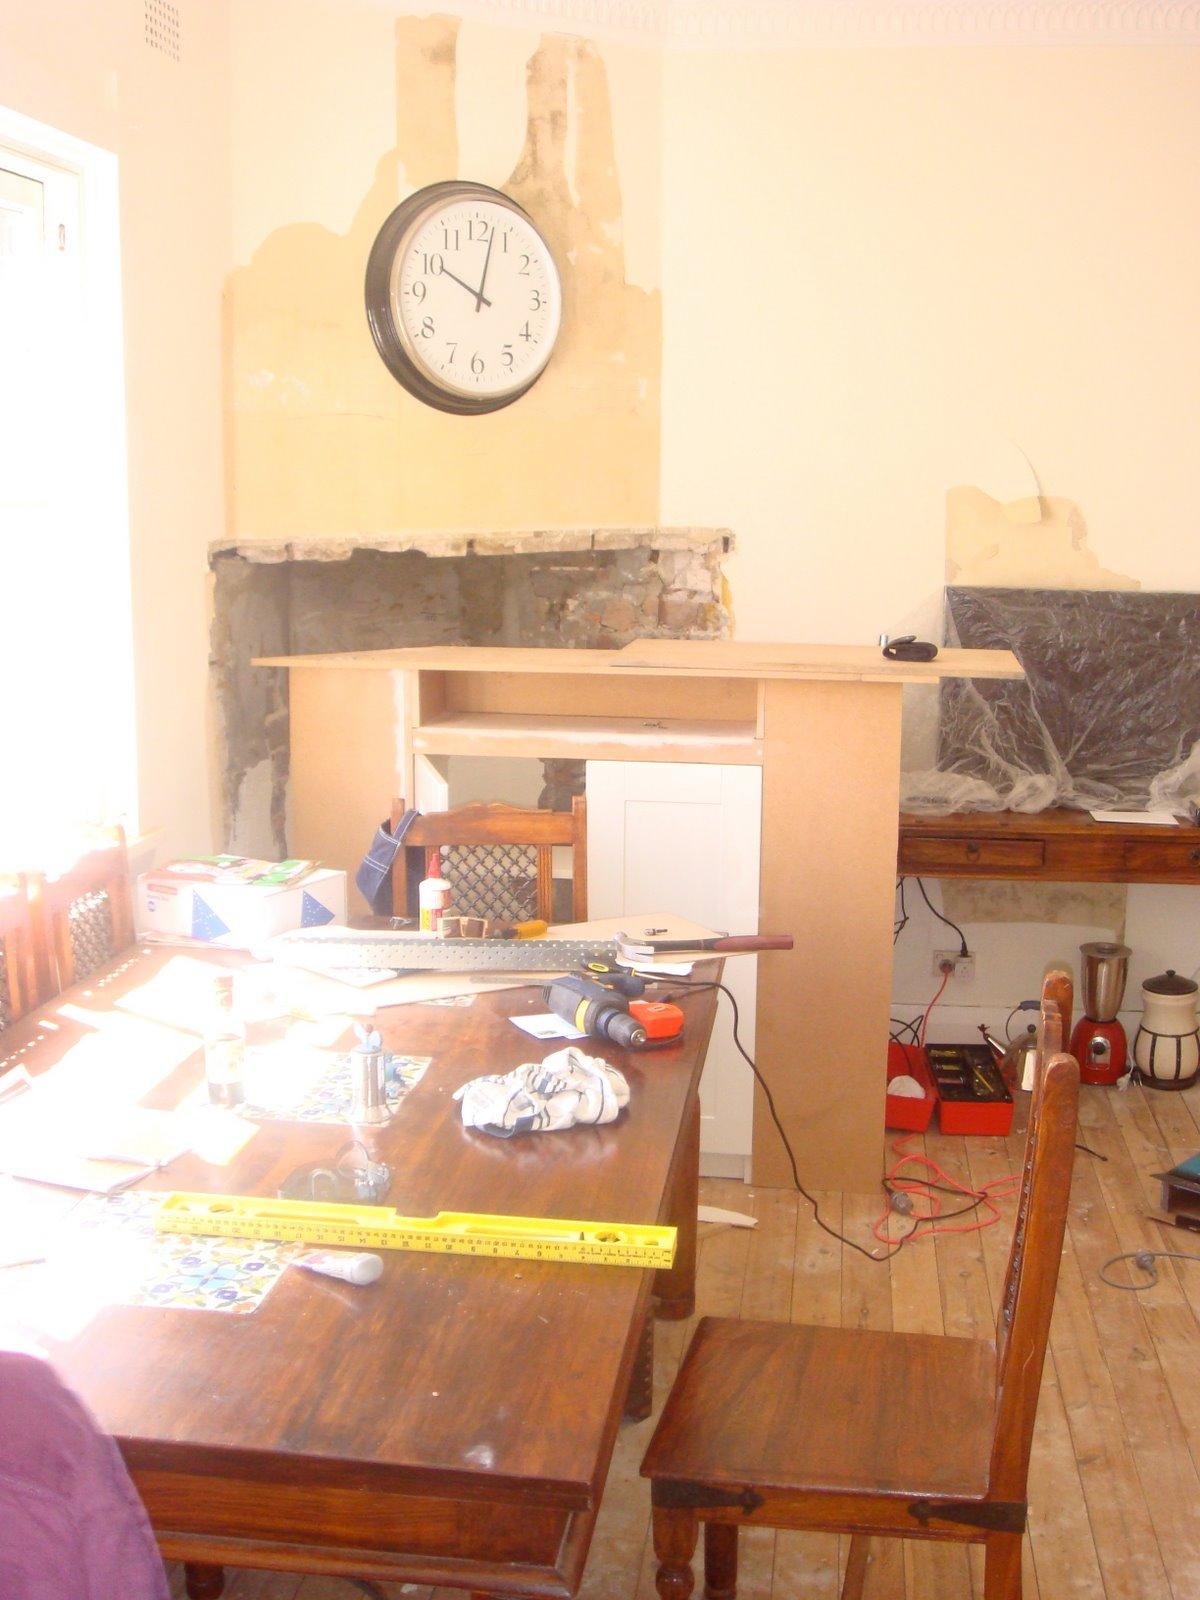 Living Room No Fireplace Tv Socket In Corner